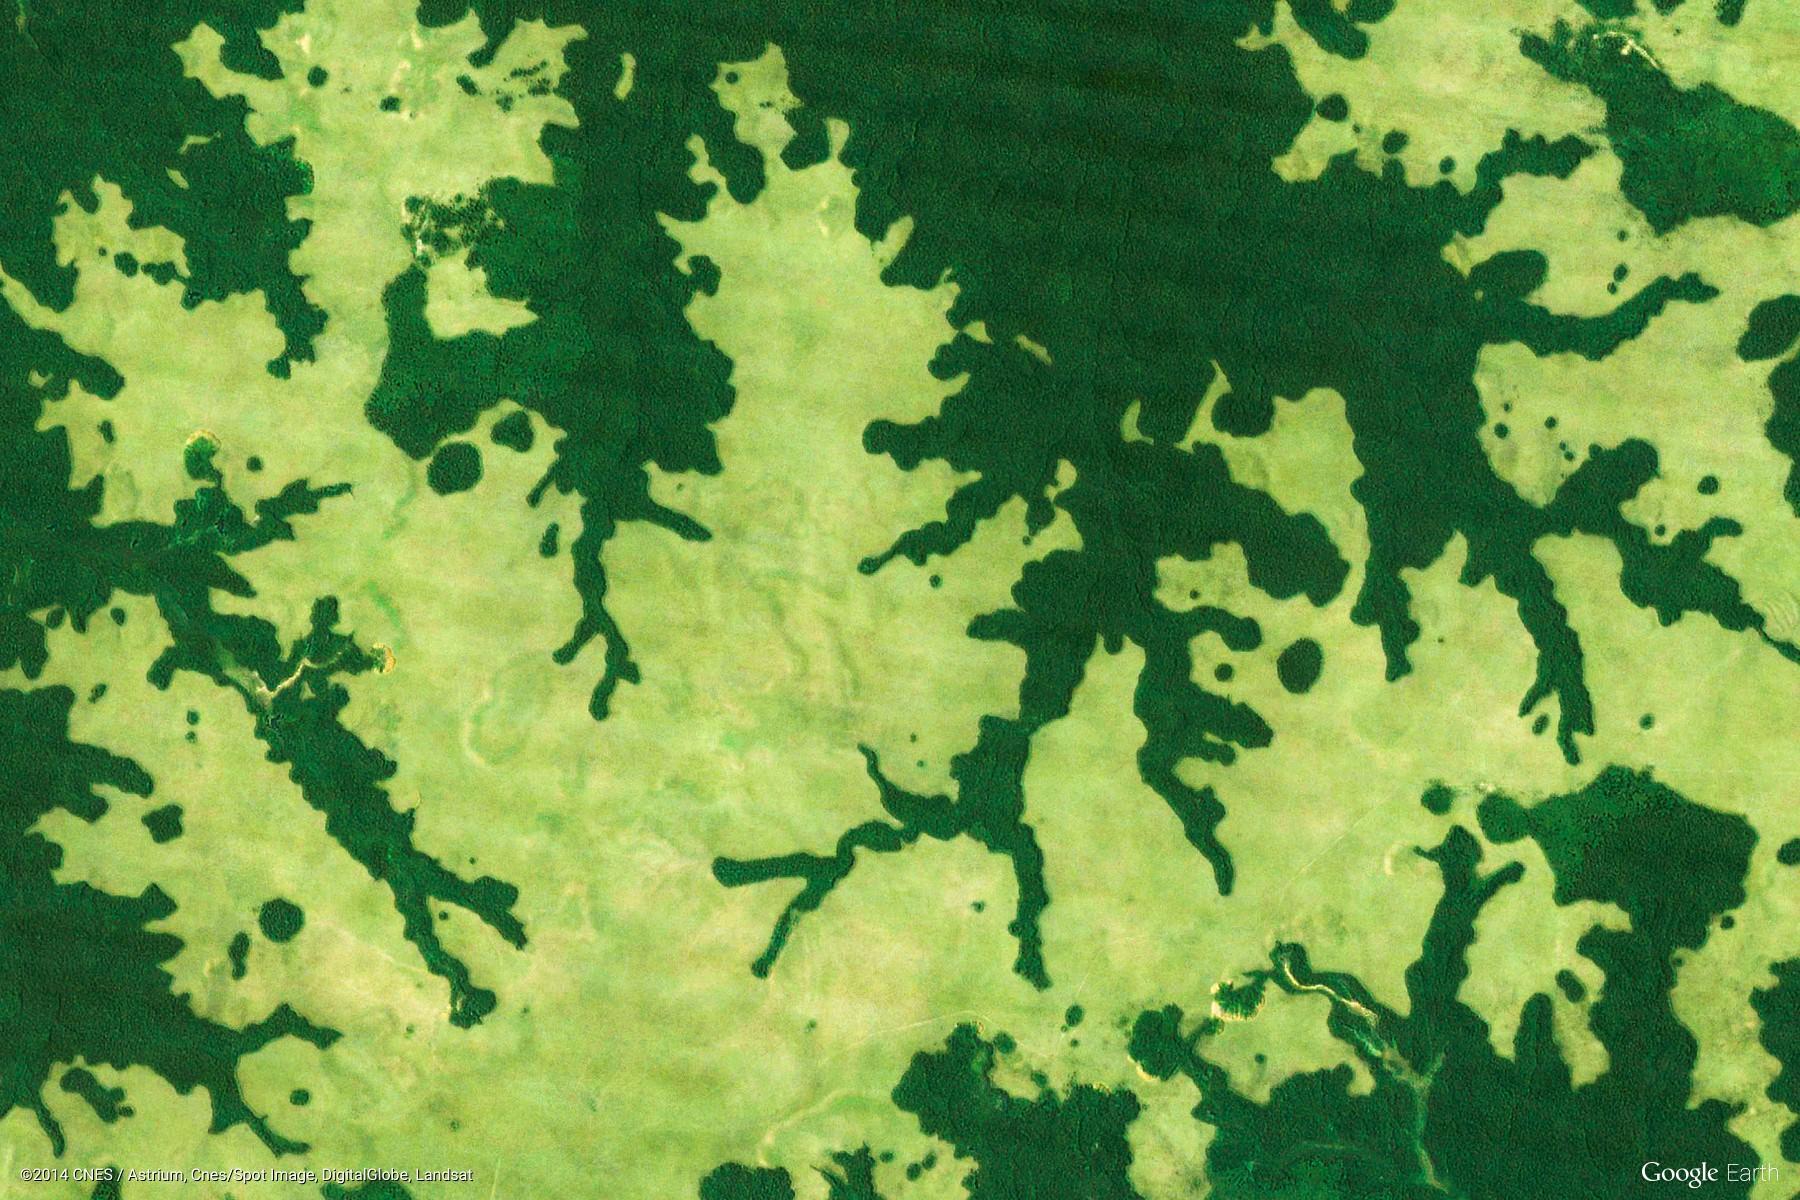 4Ggoogle-earth-view-2103.jpg